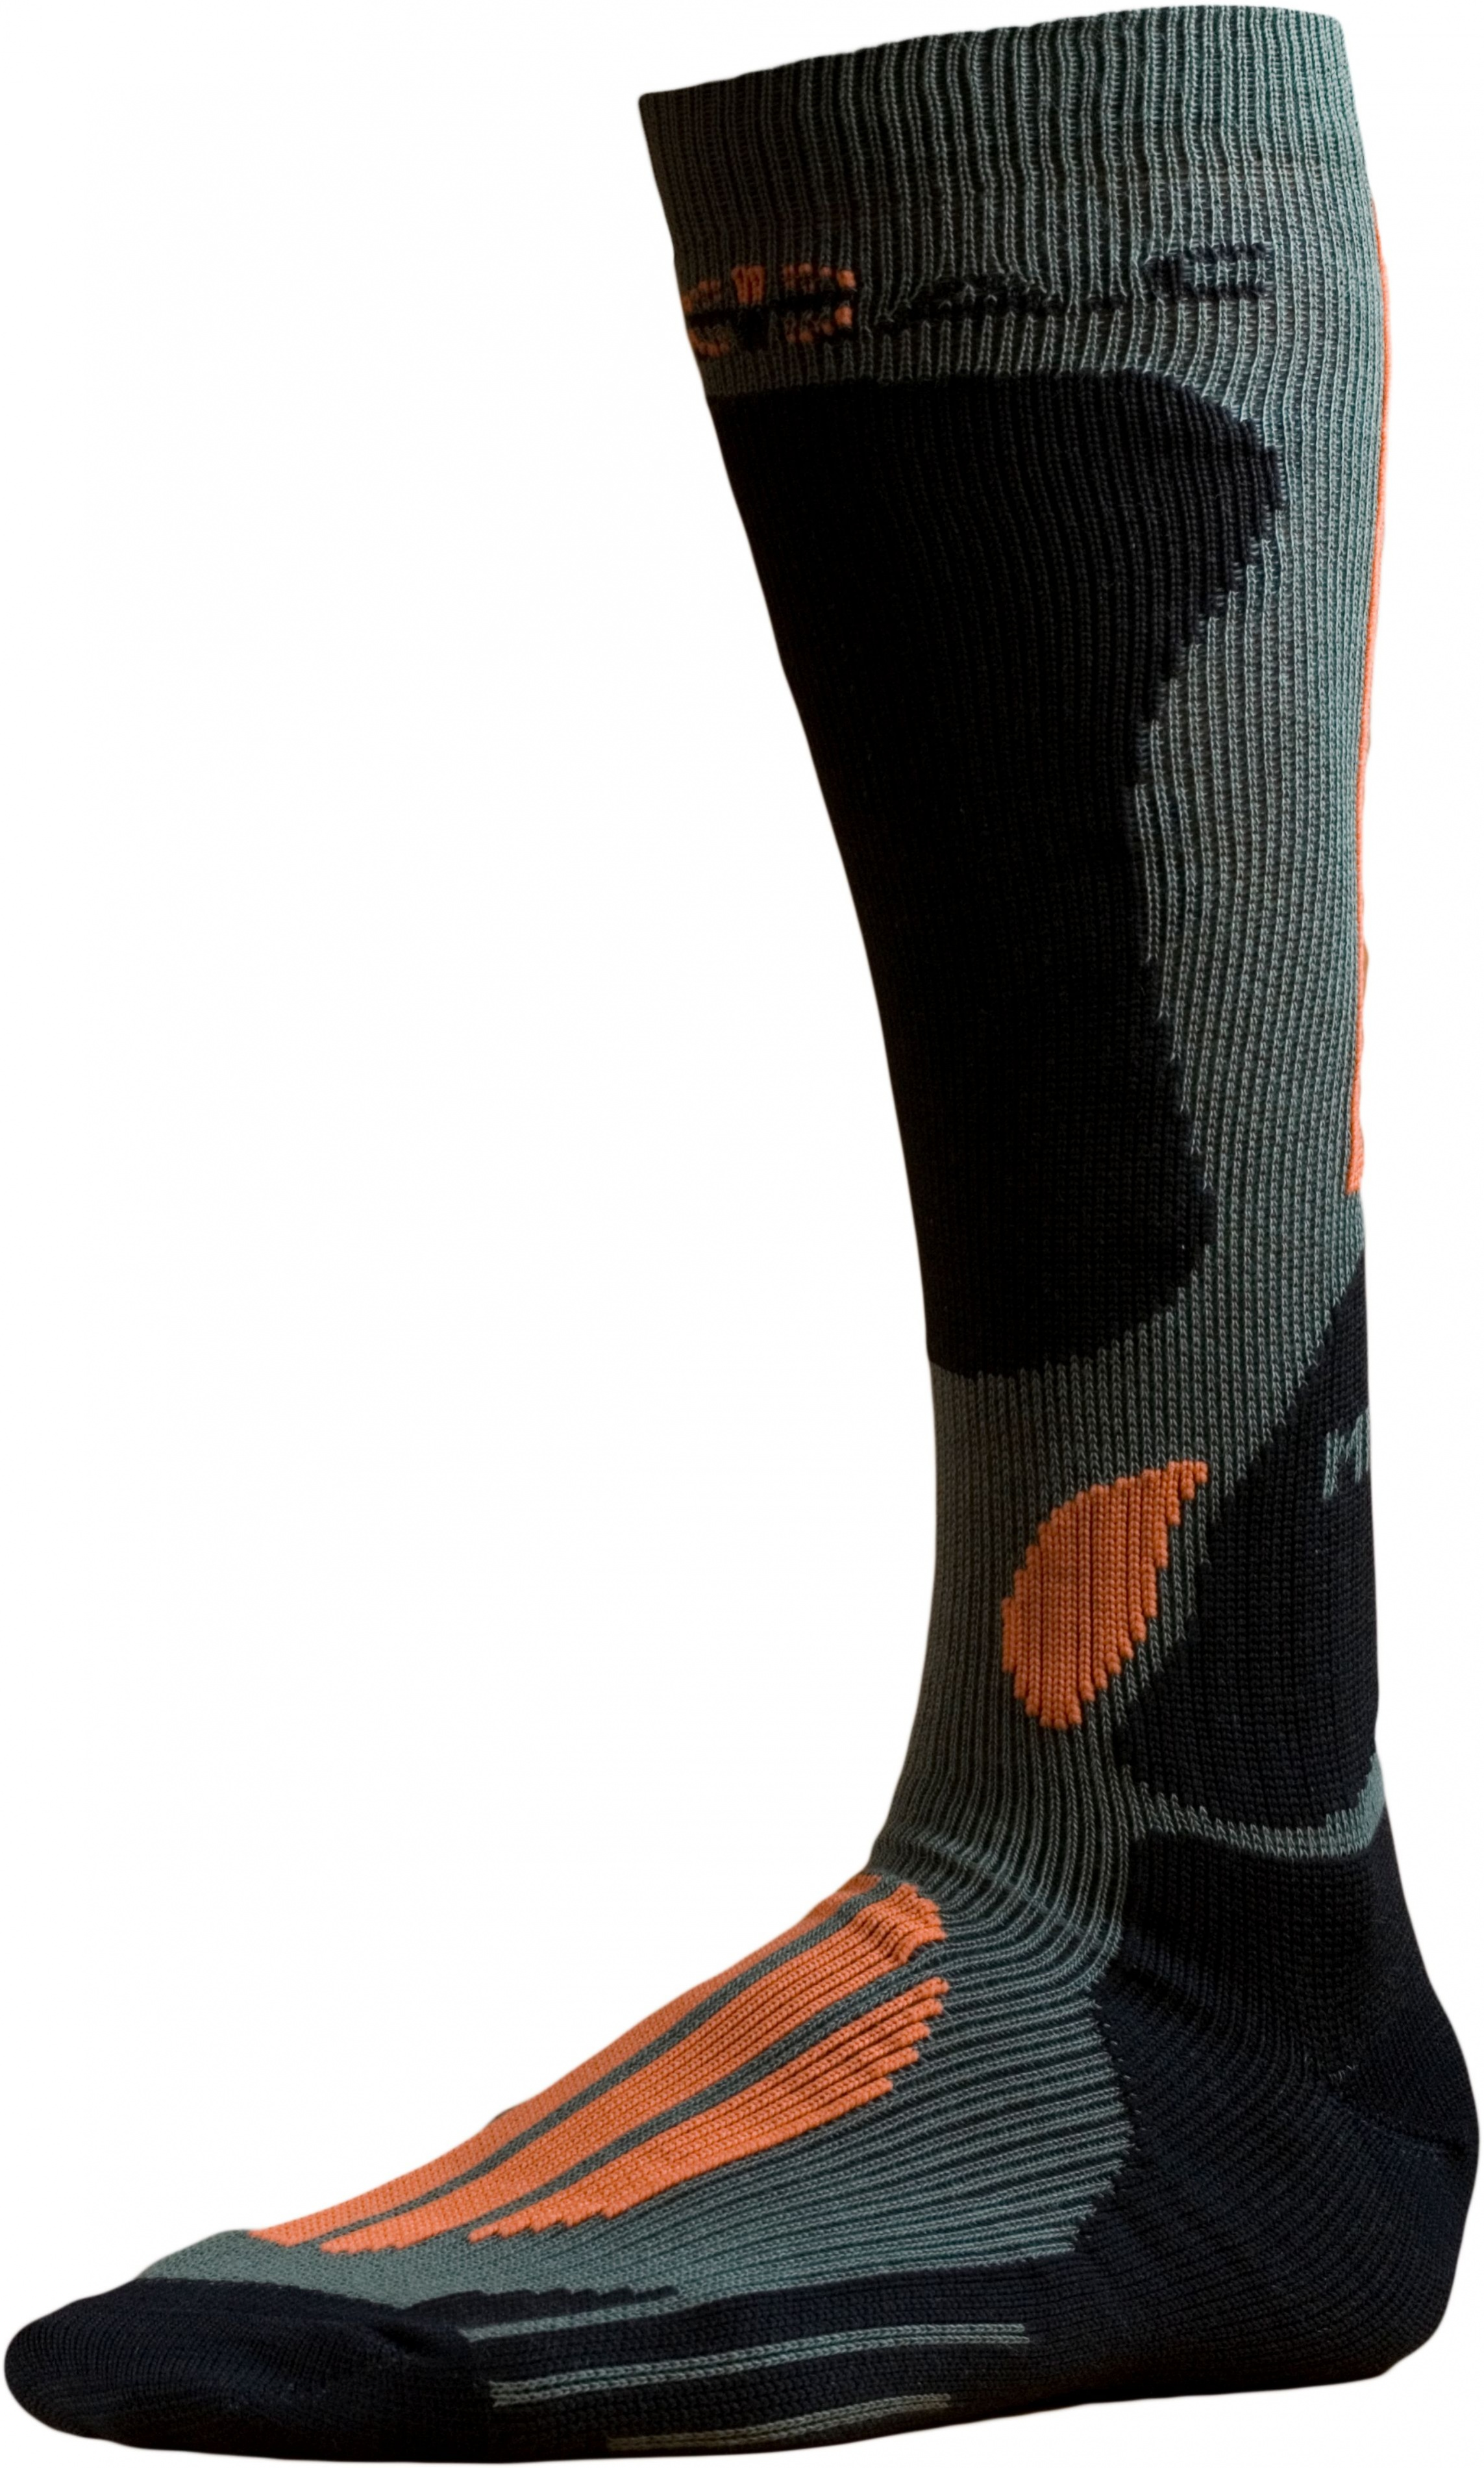 Ponožky BATAC Mission MI02 vel. 34-35 - olive/orange